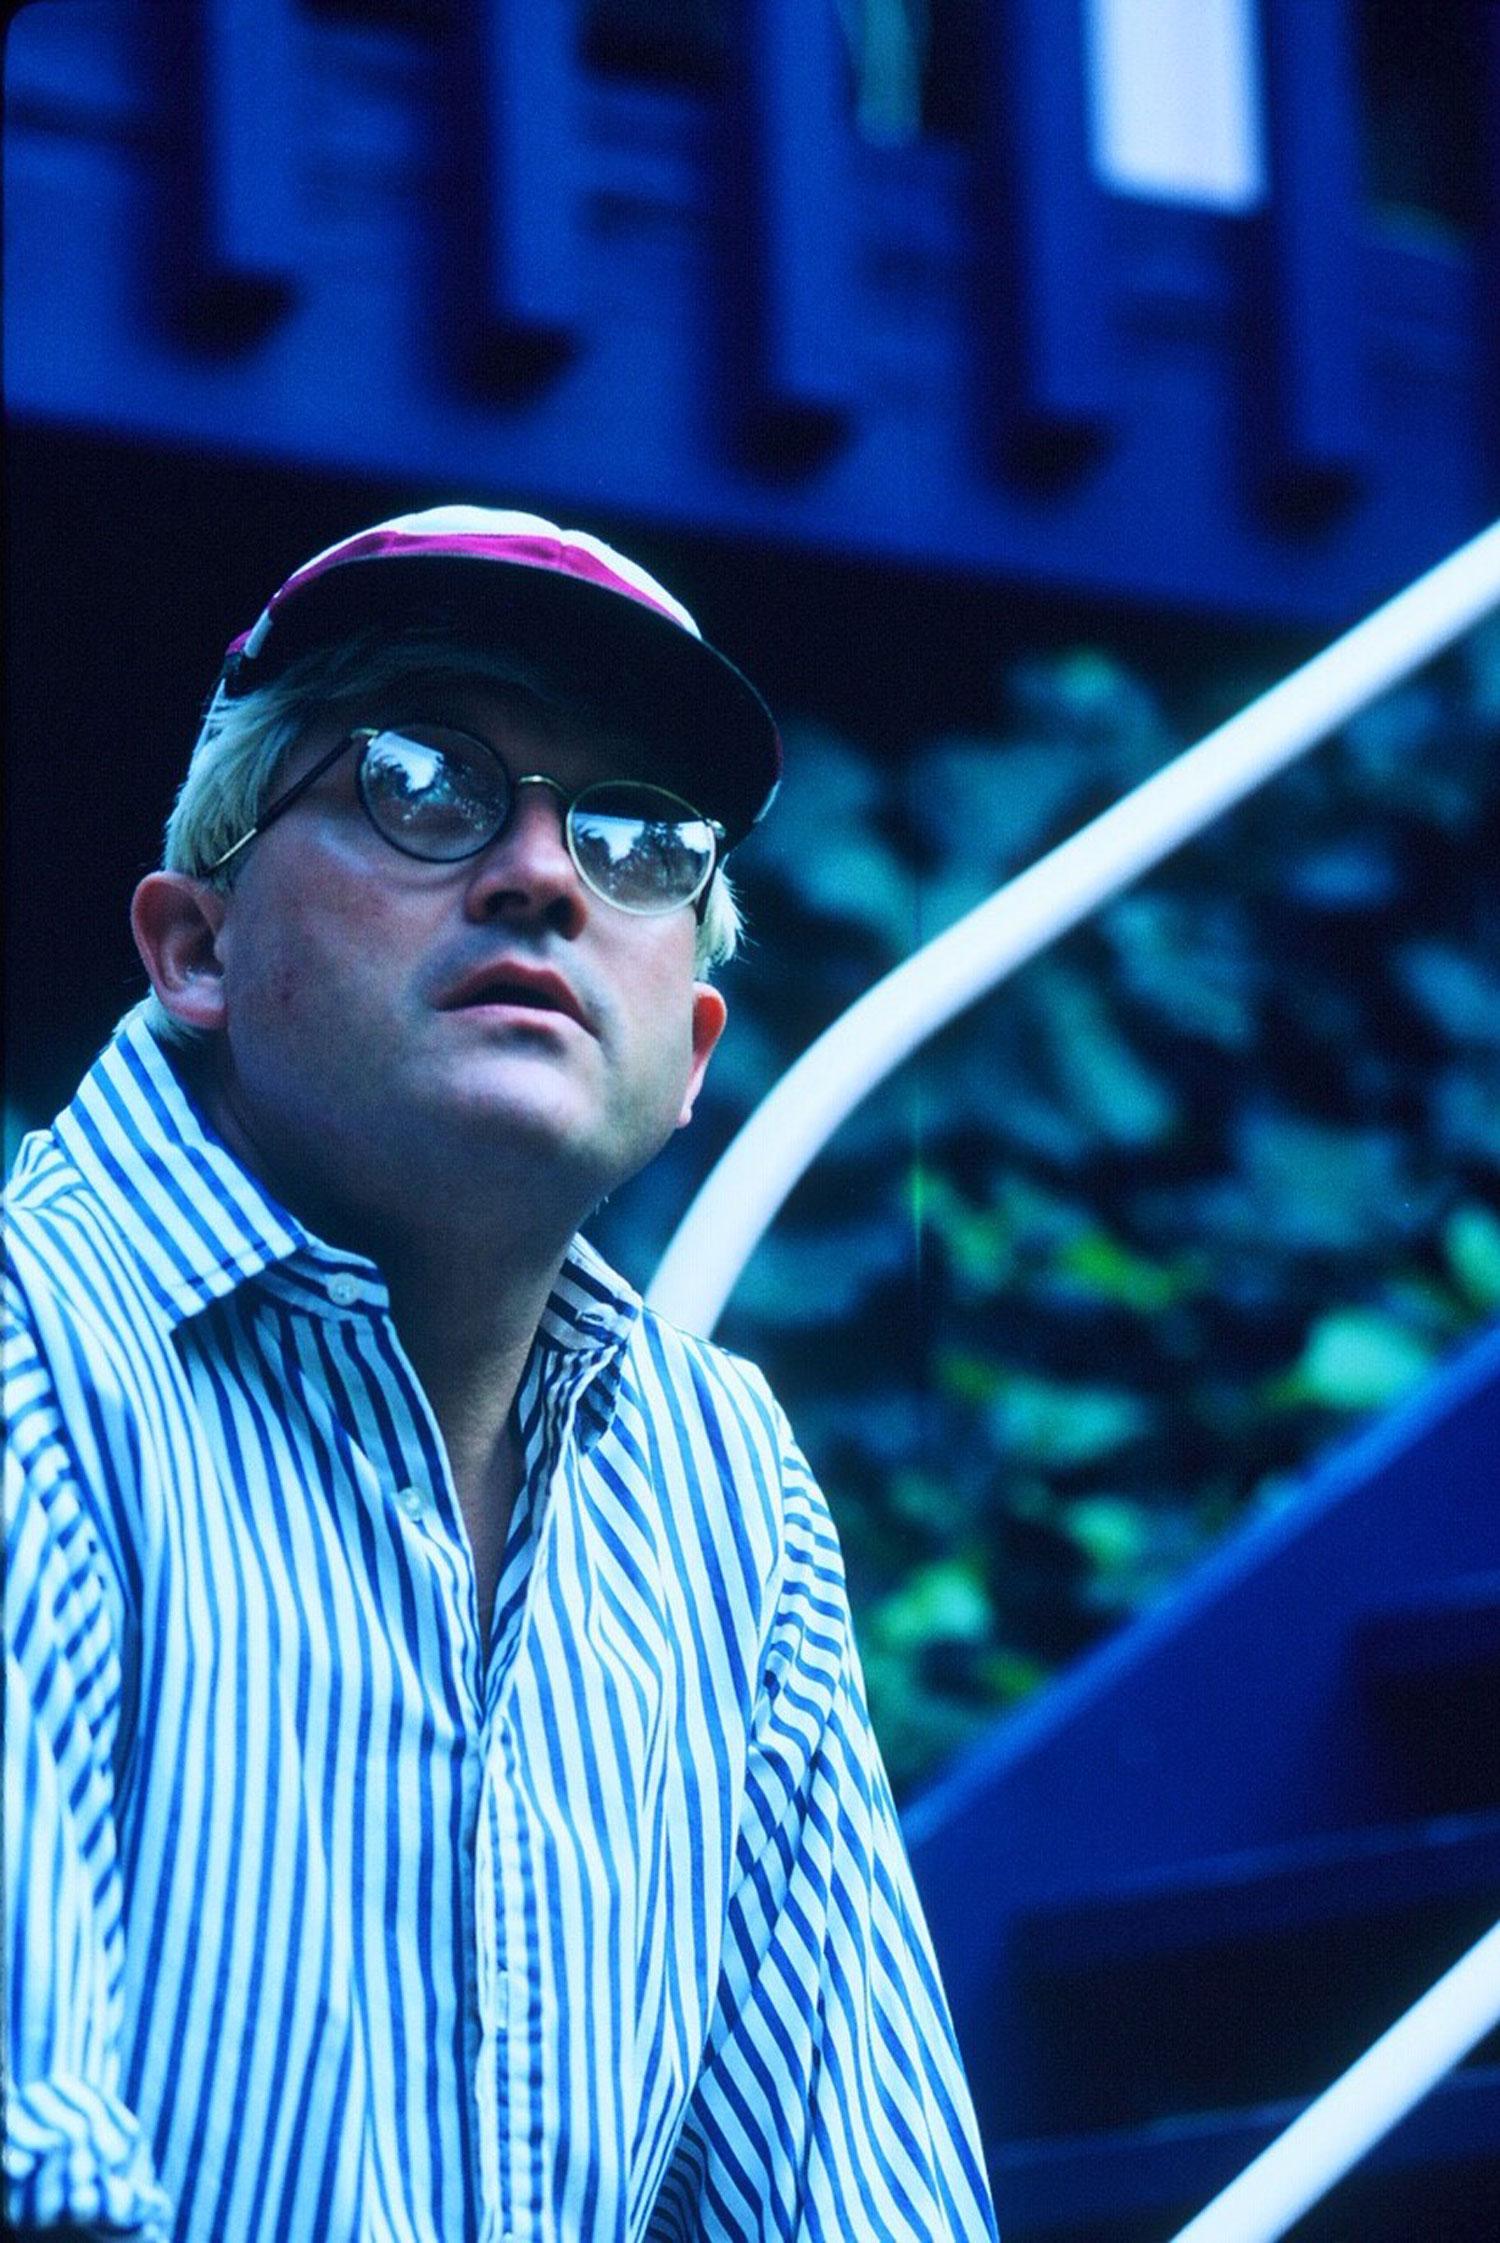 Hockney's gaze